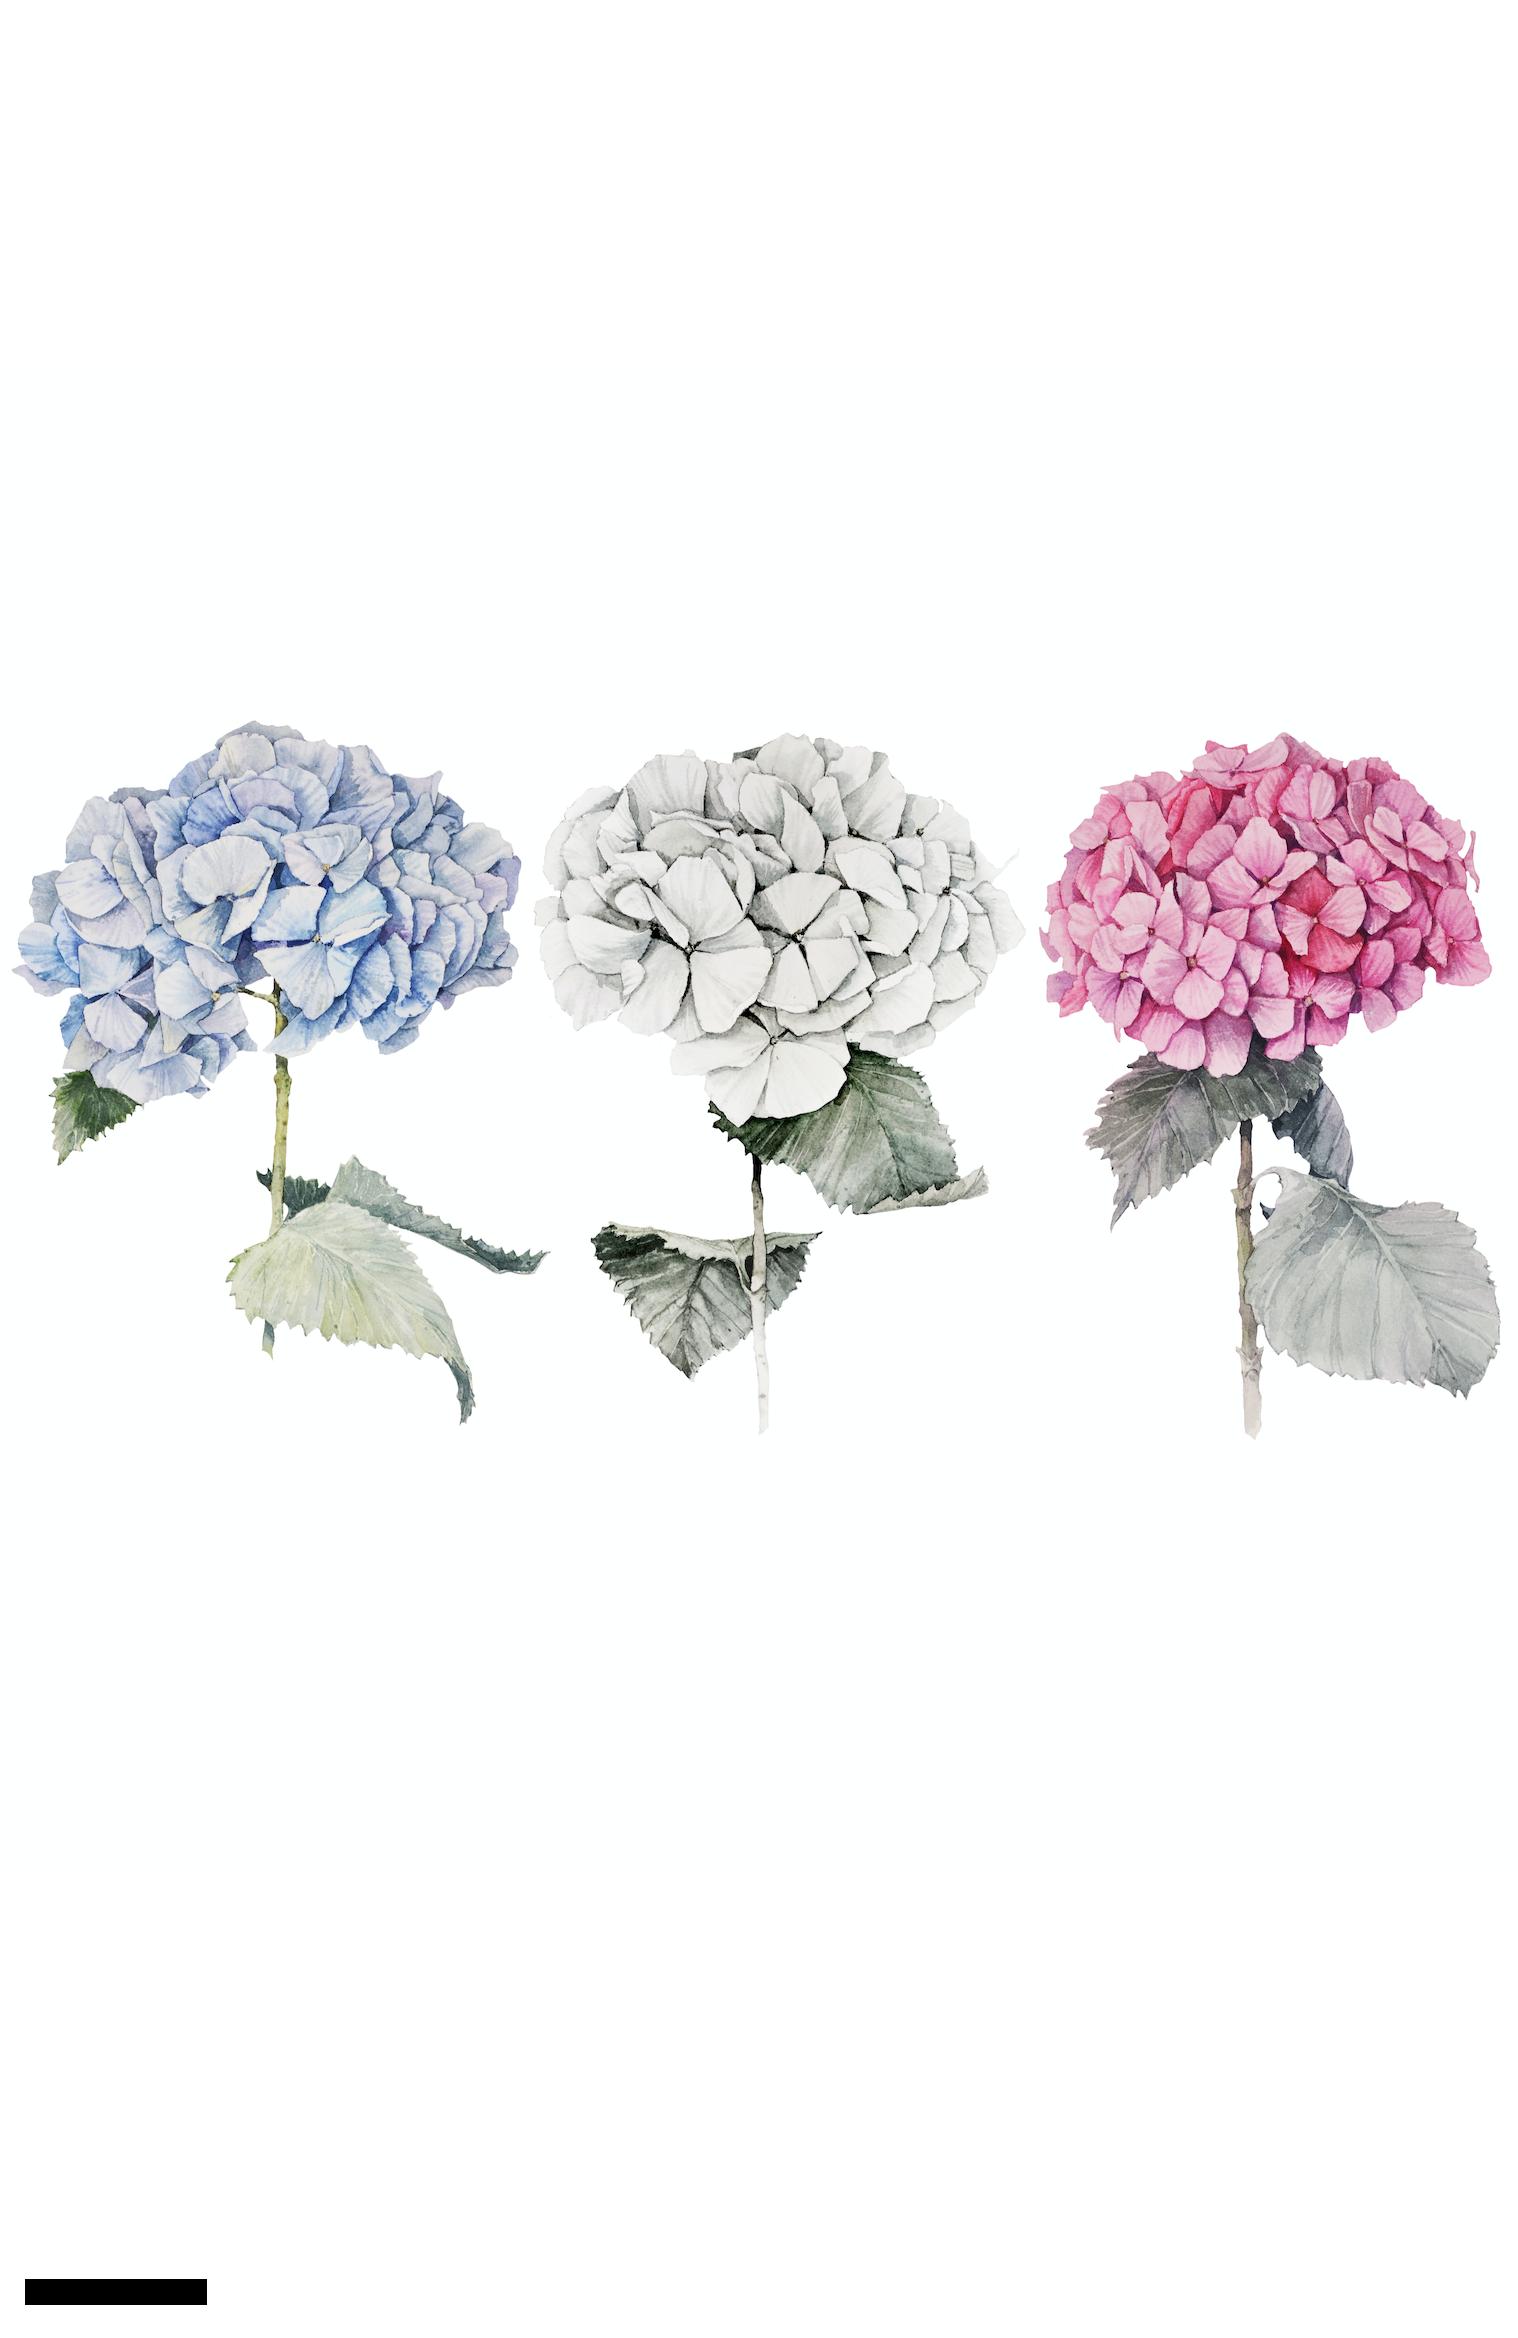 Обои гортензия, цветы, комната. Цветы foto 4